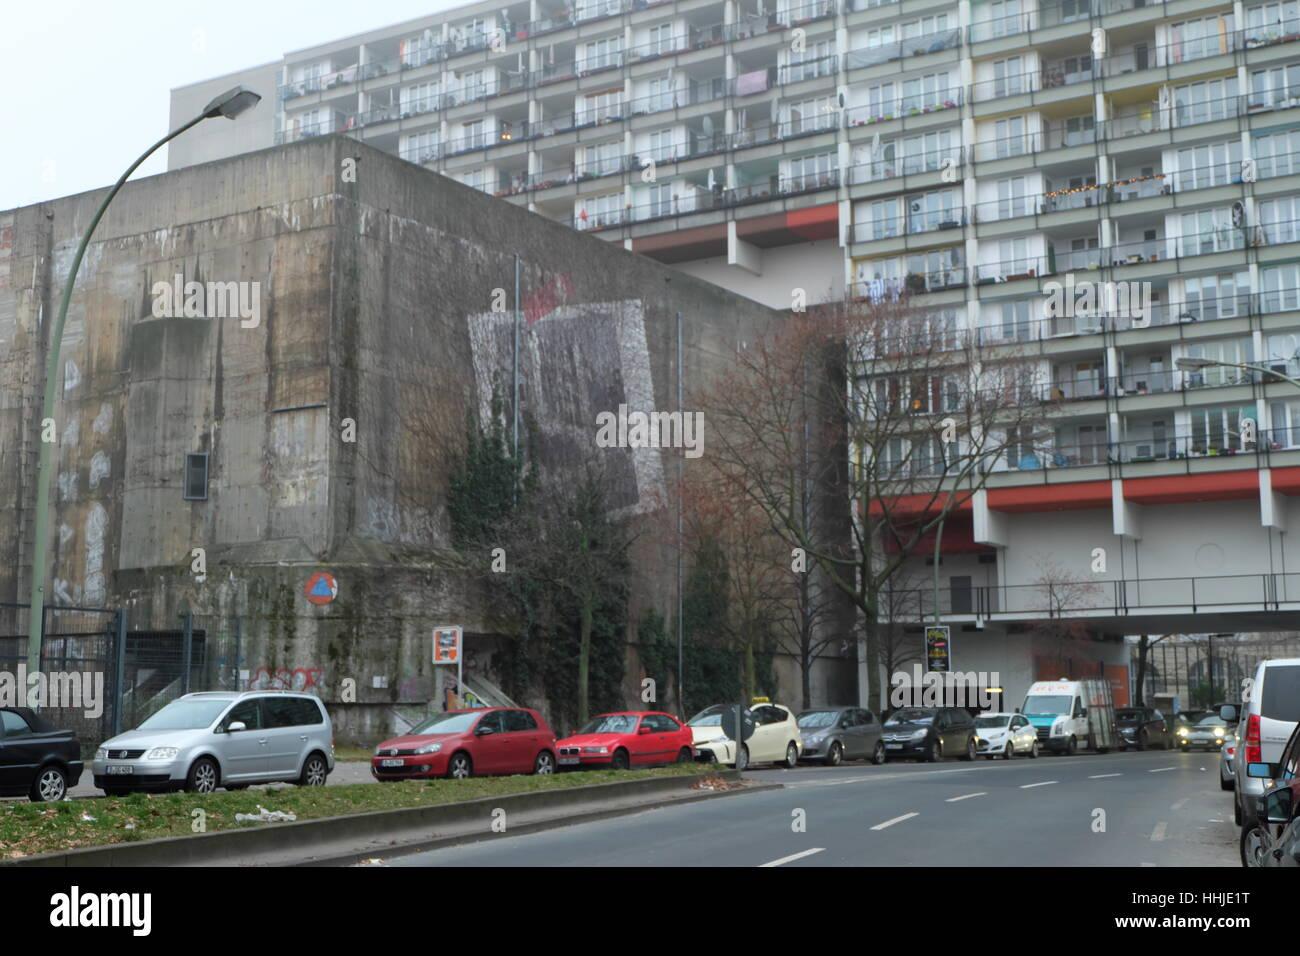 Indestructable wartime air raid bunker built on for social housing in Pallasstrasse, Berlin, Schoneburg. Stock Photo